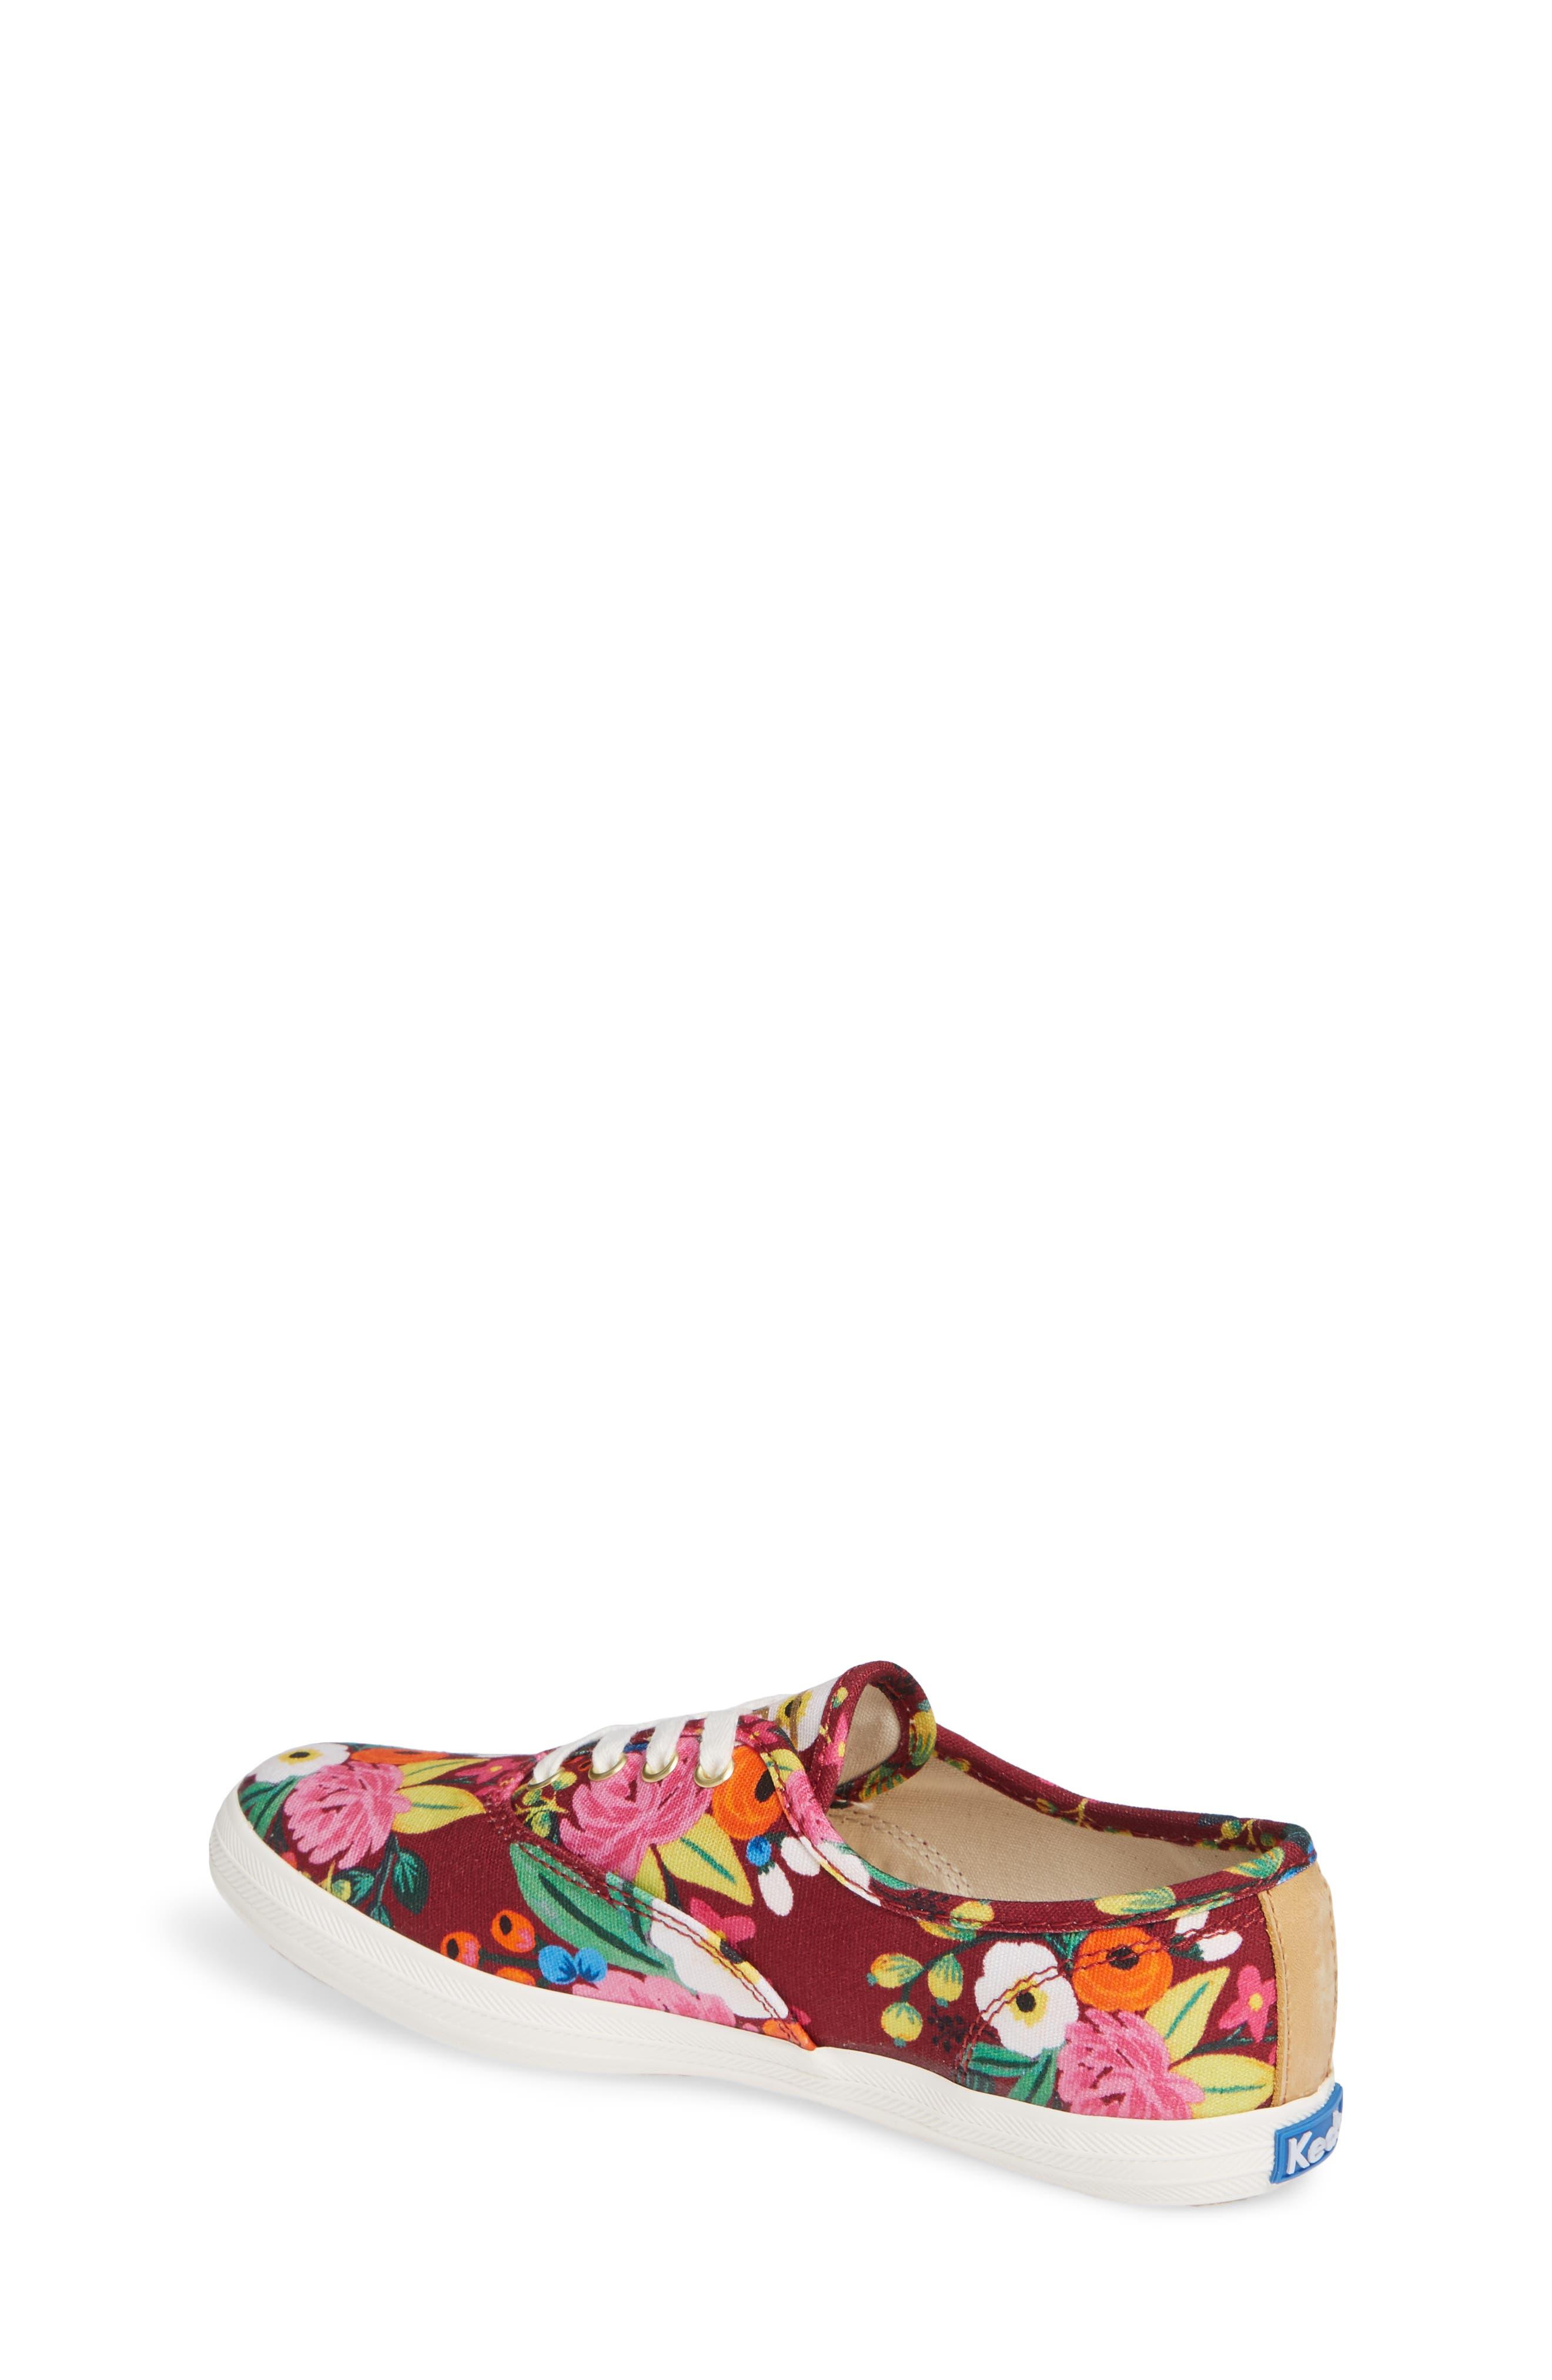 x Rifle Paper Co. Floral Print Champion Sneaker,                             Alternate thumbnail 2, color,                             VINTAGE BLOSSOM